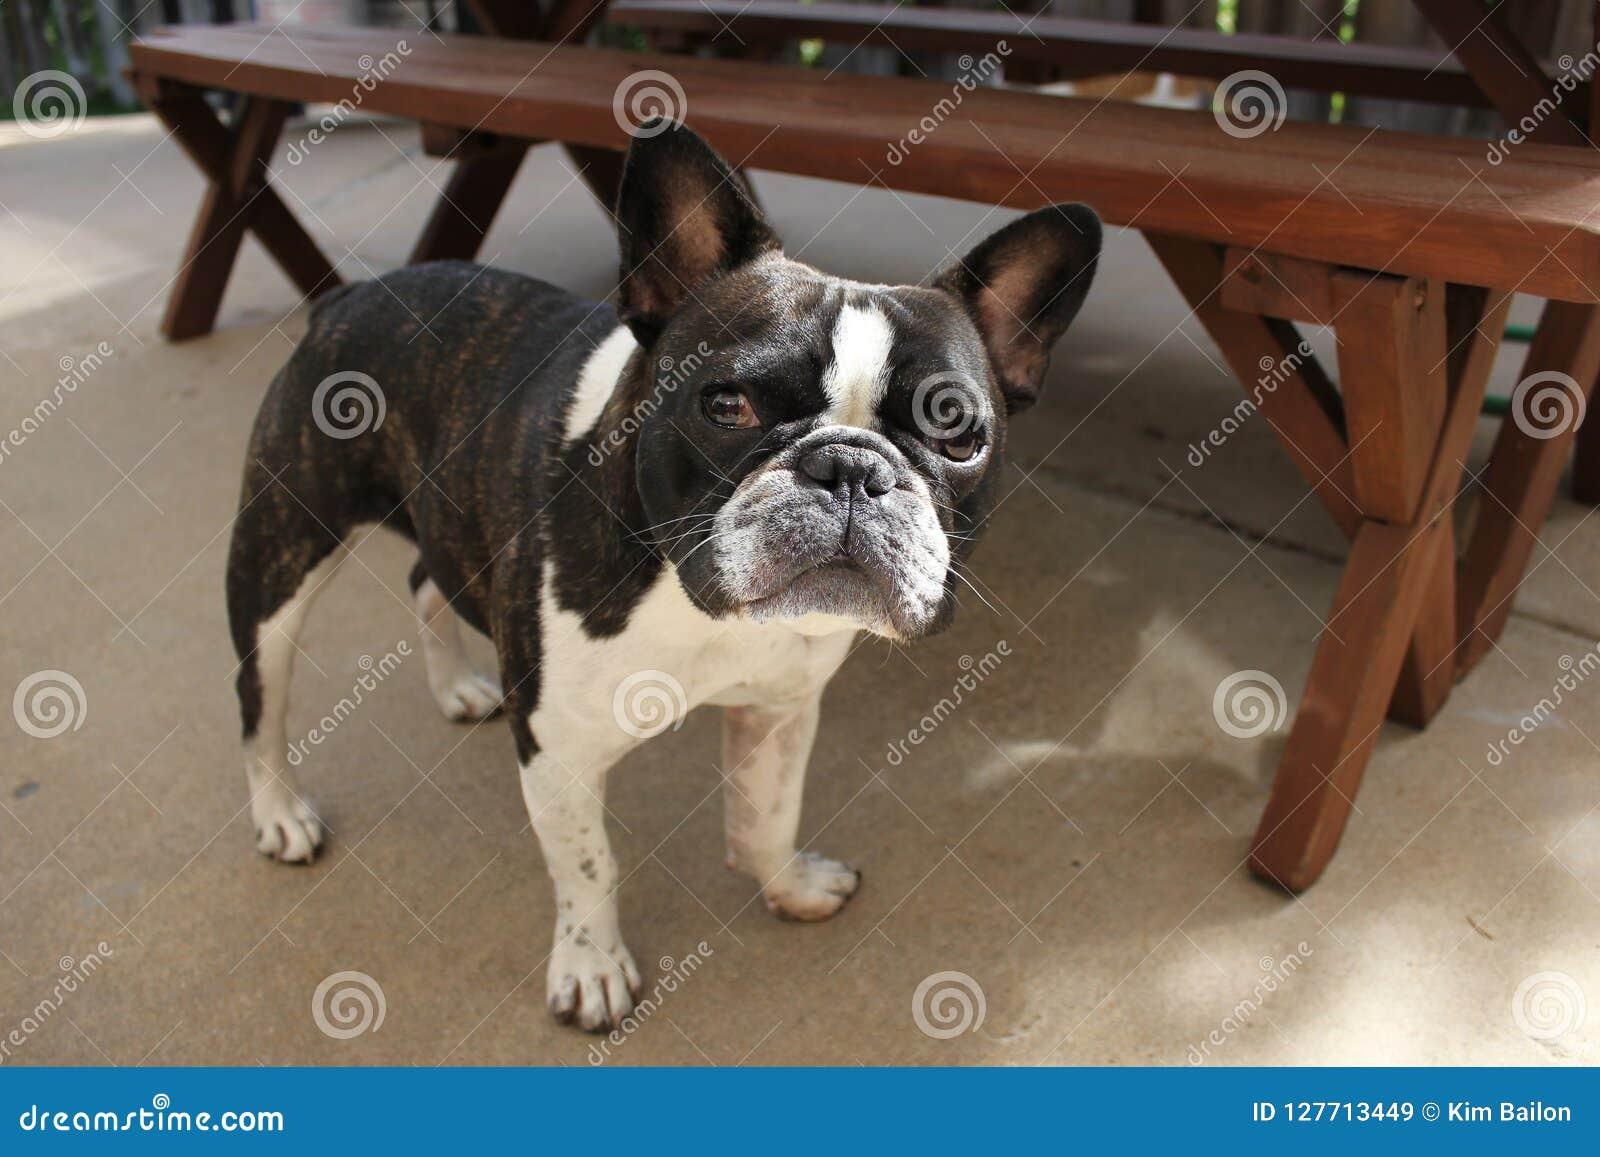 Svartvit strimmig fransk bulldogg